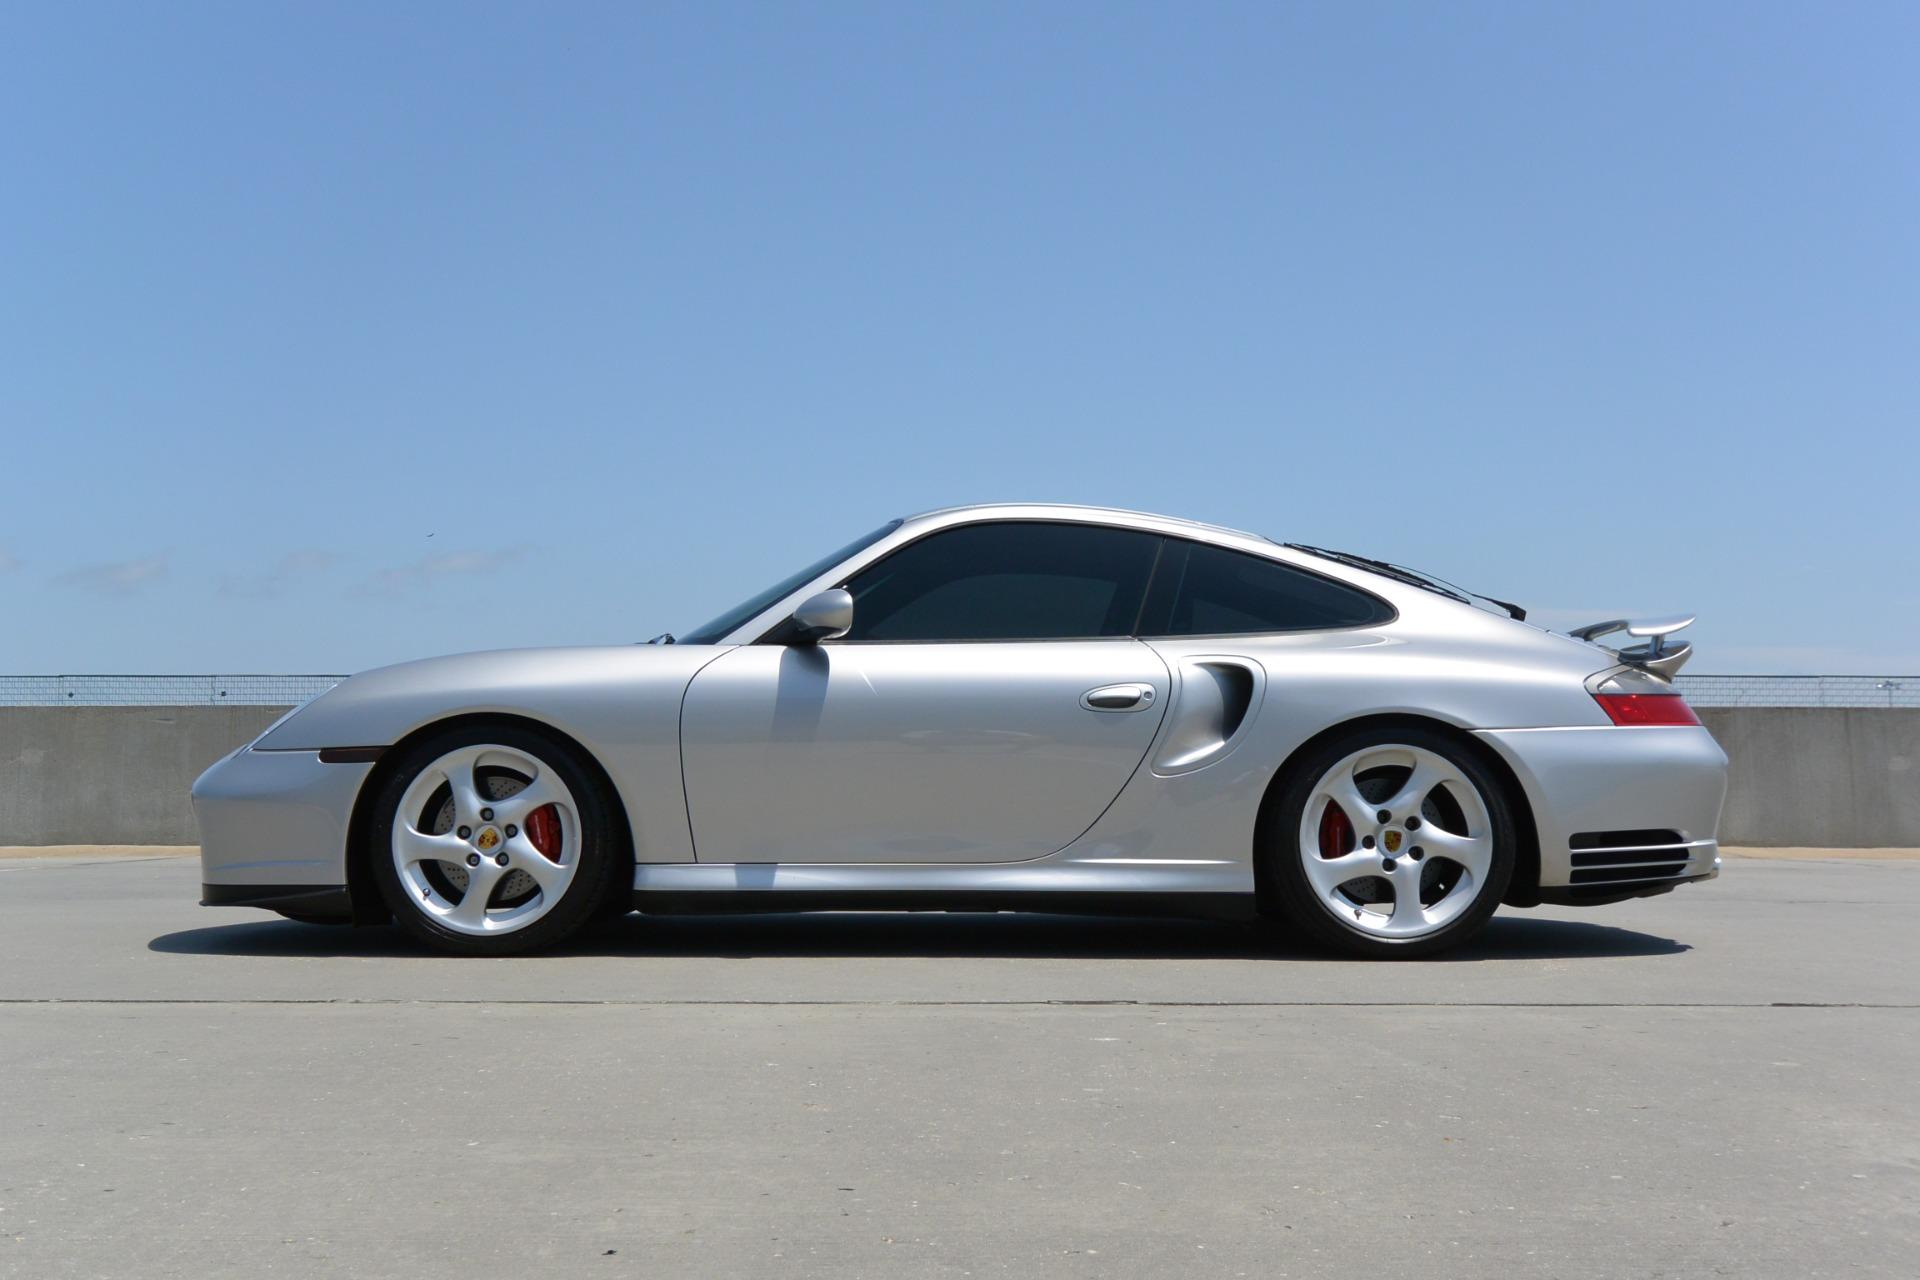 Used 2001 Porsche 911 Carrera Turbo | Jackson, MS